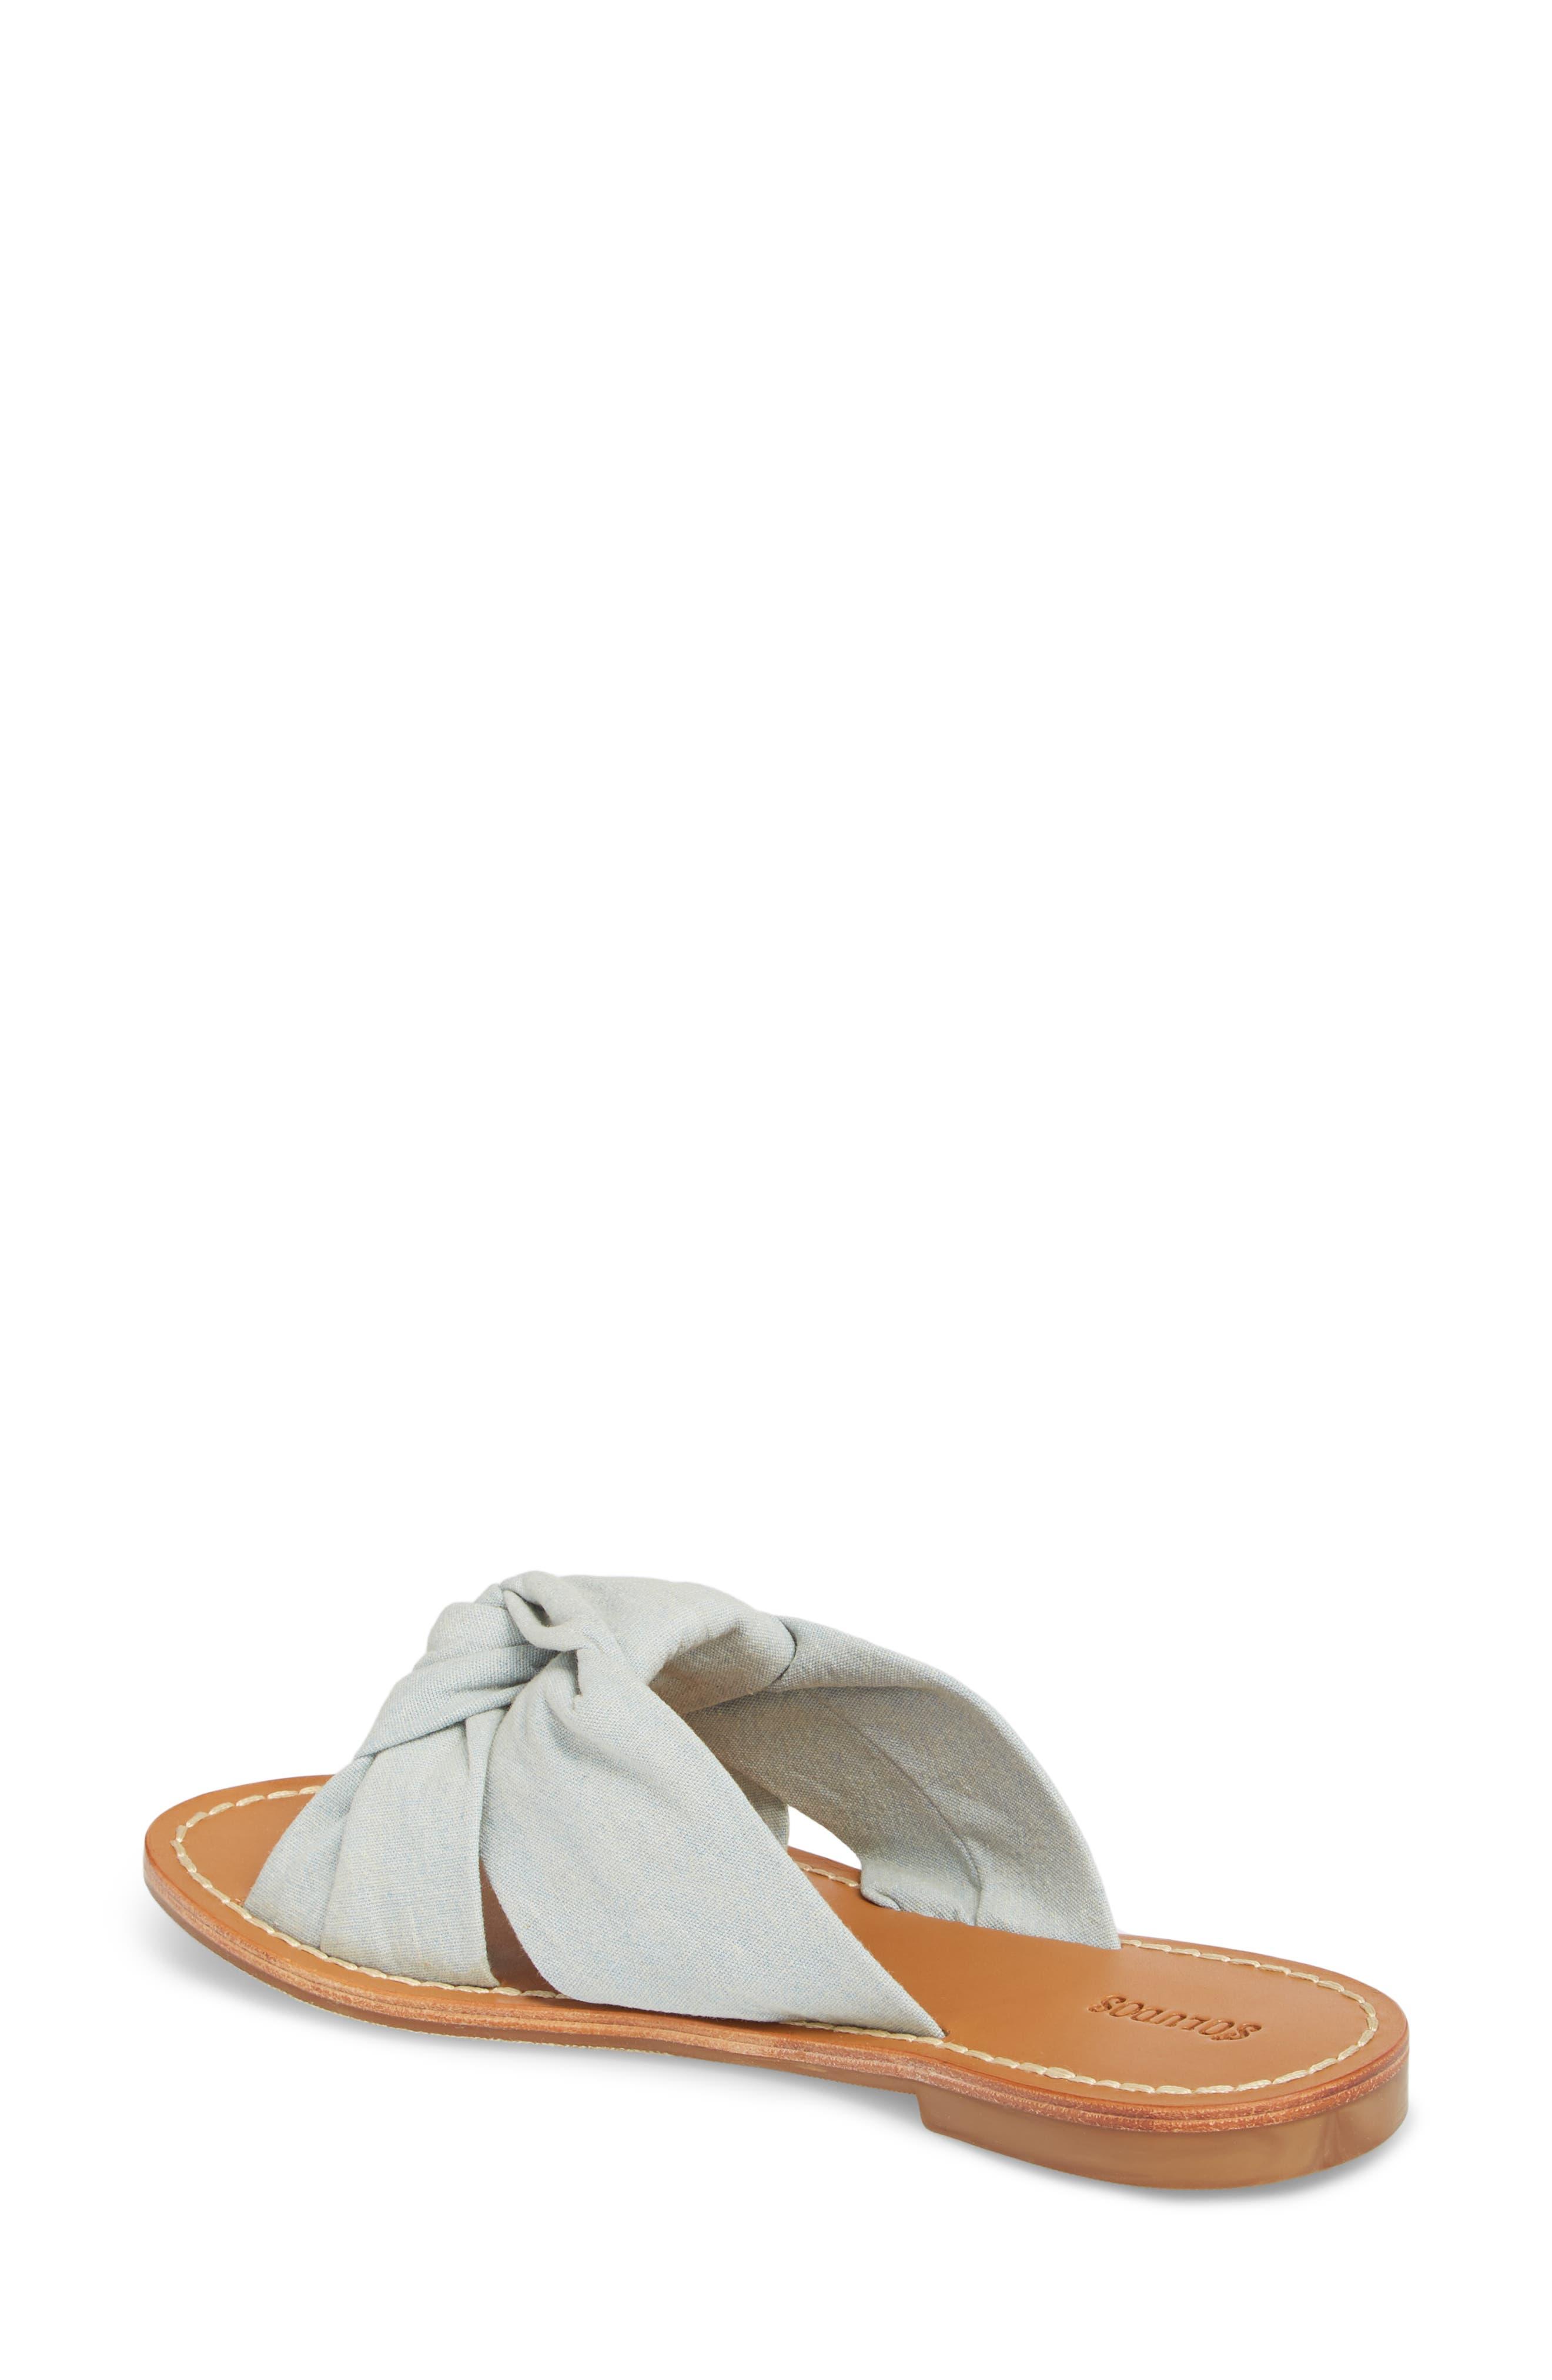 Knotted Slide Sandal,                             Alternate thumbnail 2, color,                             Chambray